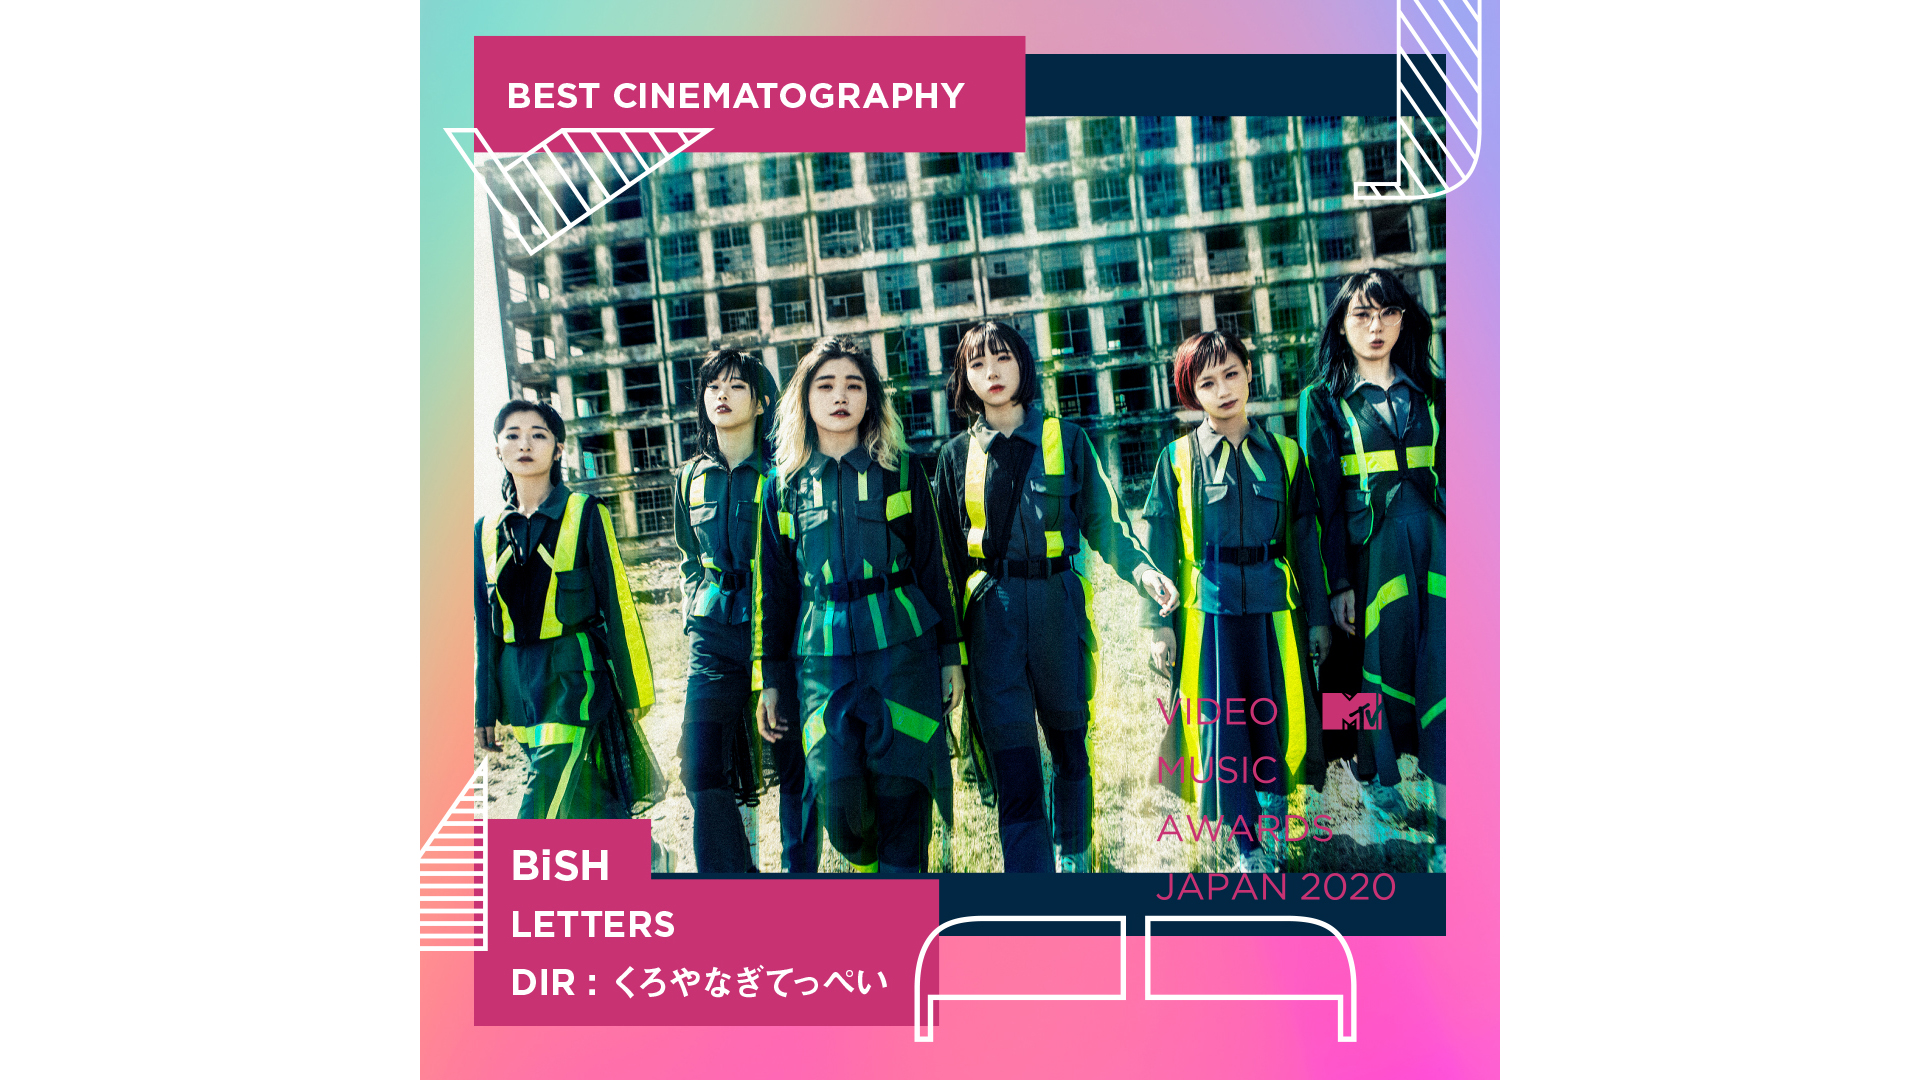 P.I.C.S. management くろやなぎてっぺいが監督を務めたBiSH「LETTERS」MVが『MTV Video Music Awards Japan』にて最優秀撮影賞を受賞